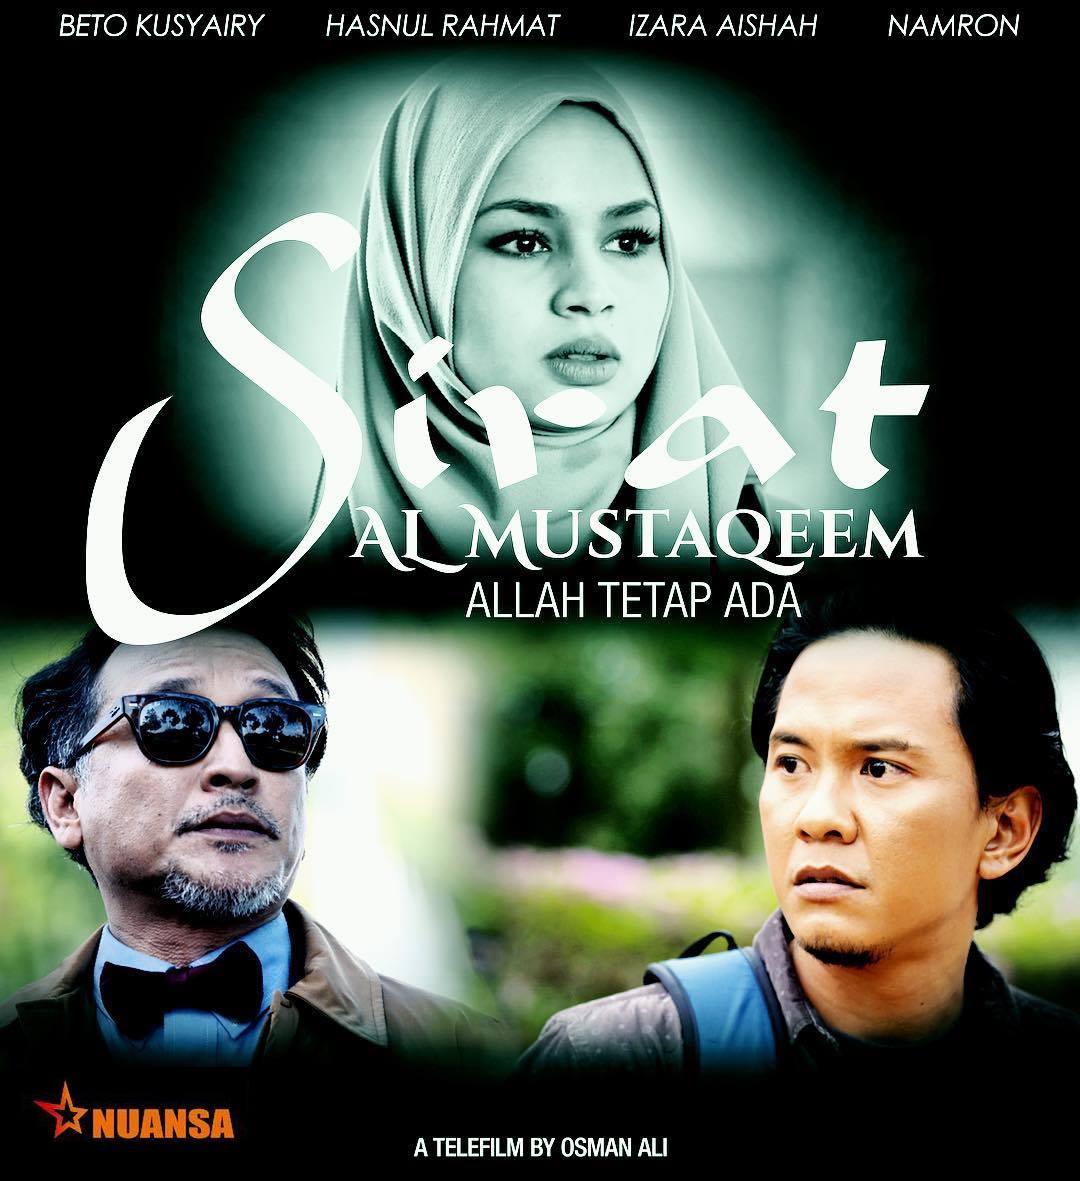 Sirat Al-Mustaqeem